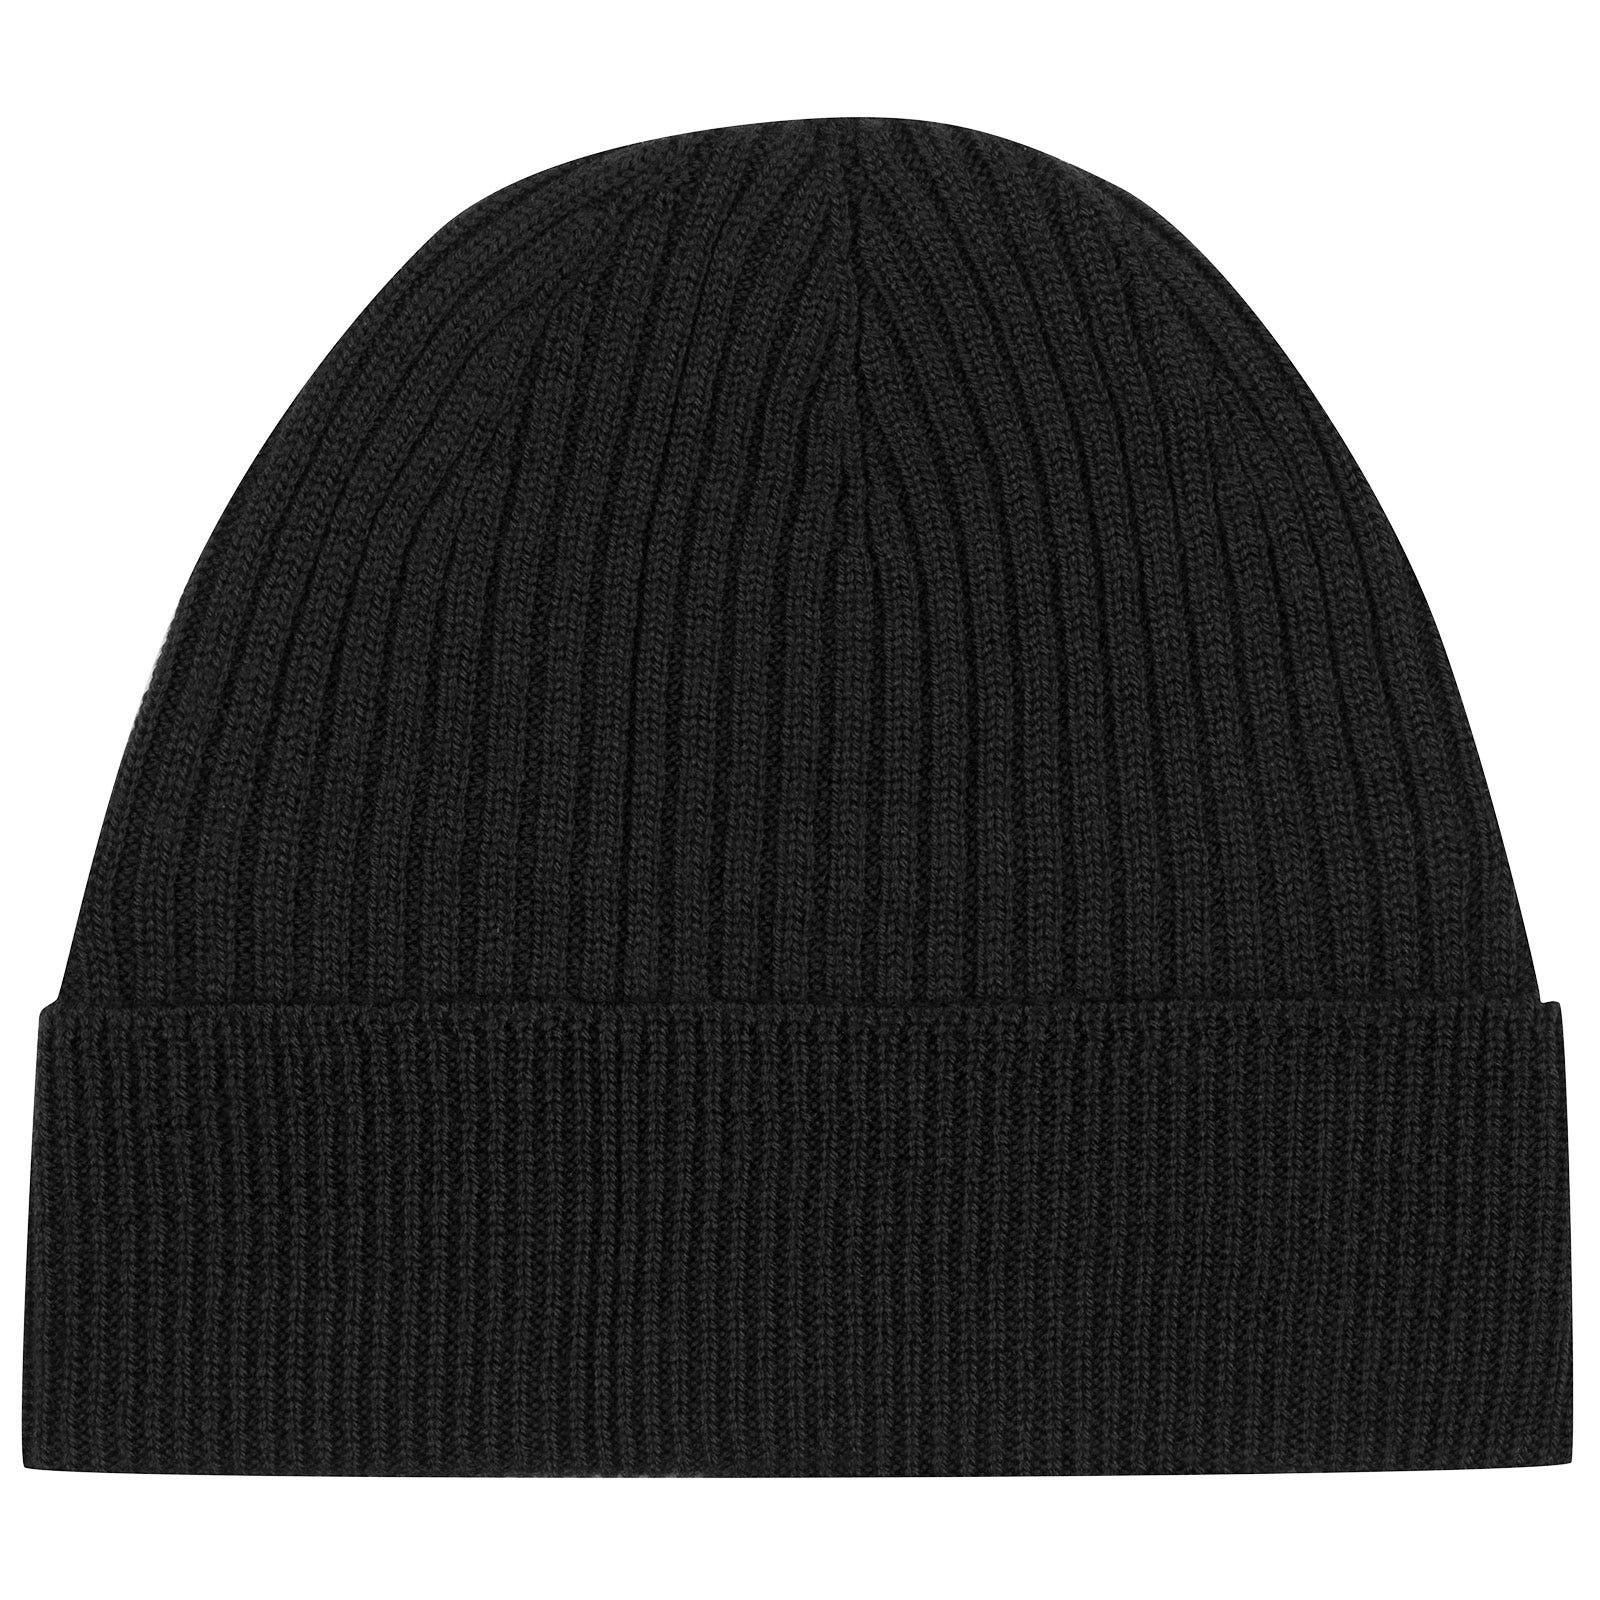 John Smedley Fahrenheit in Black Hat-ONE